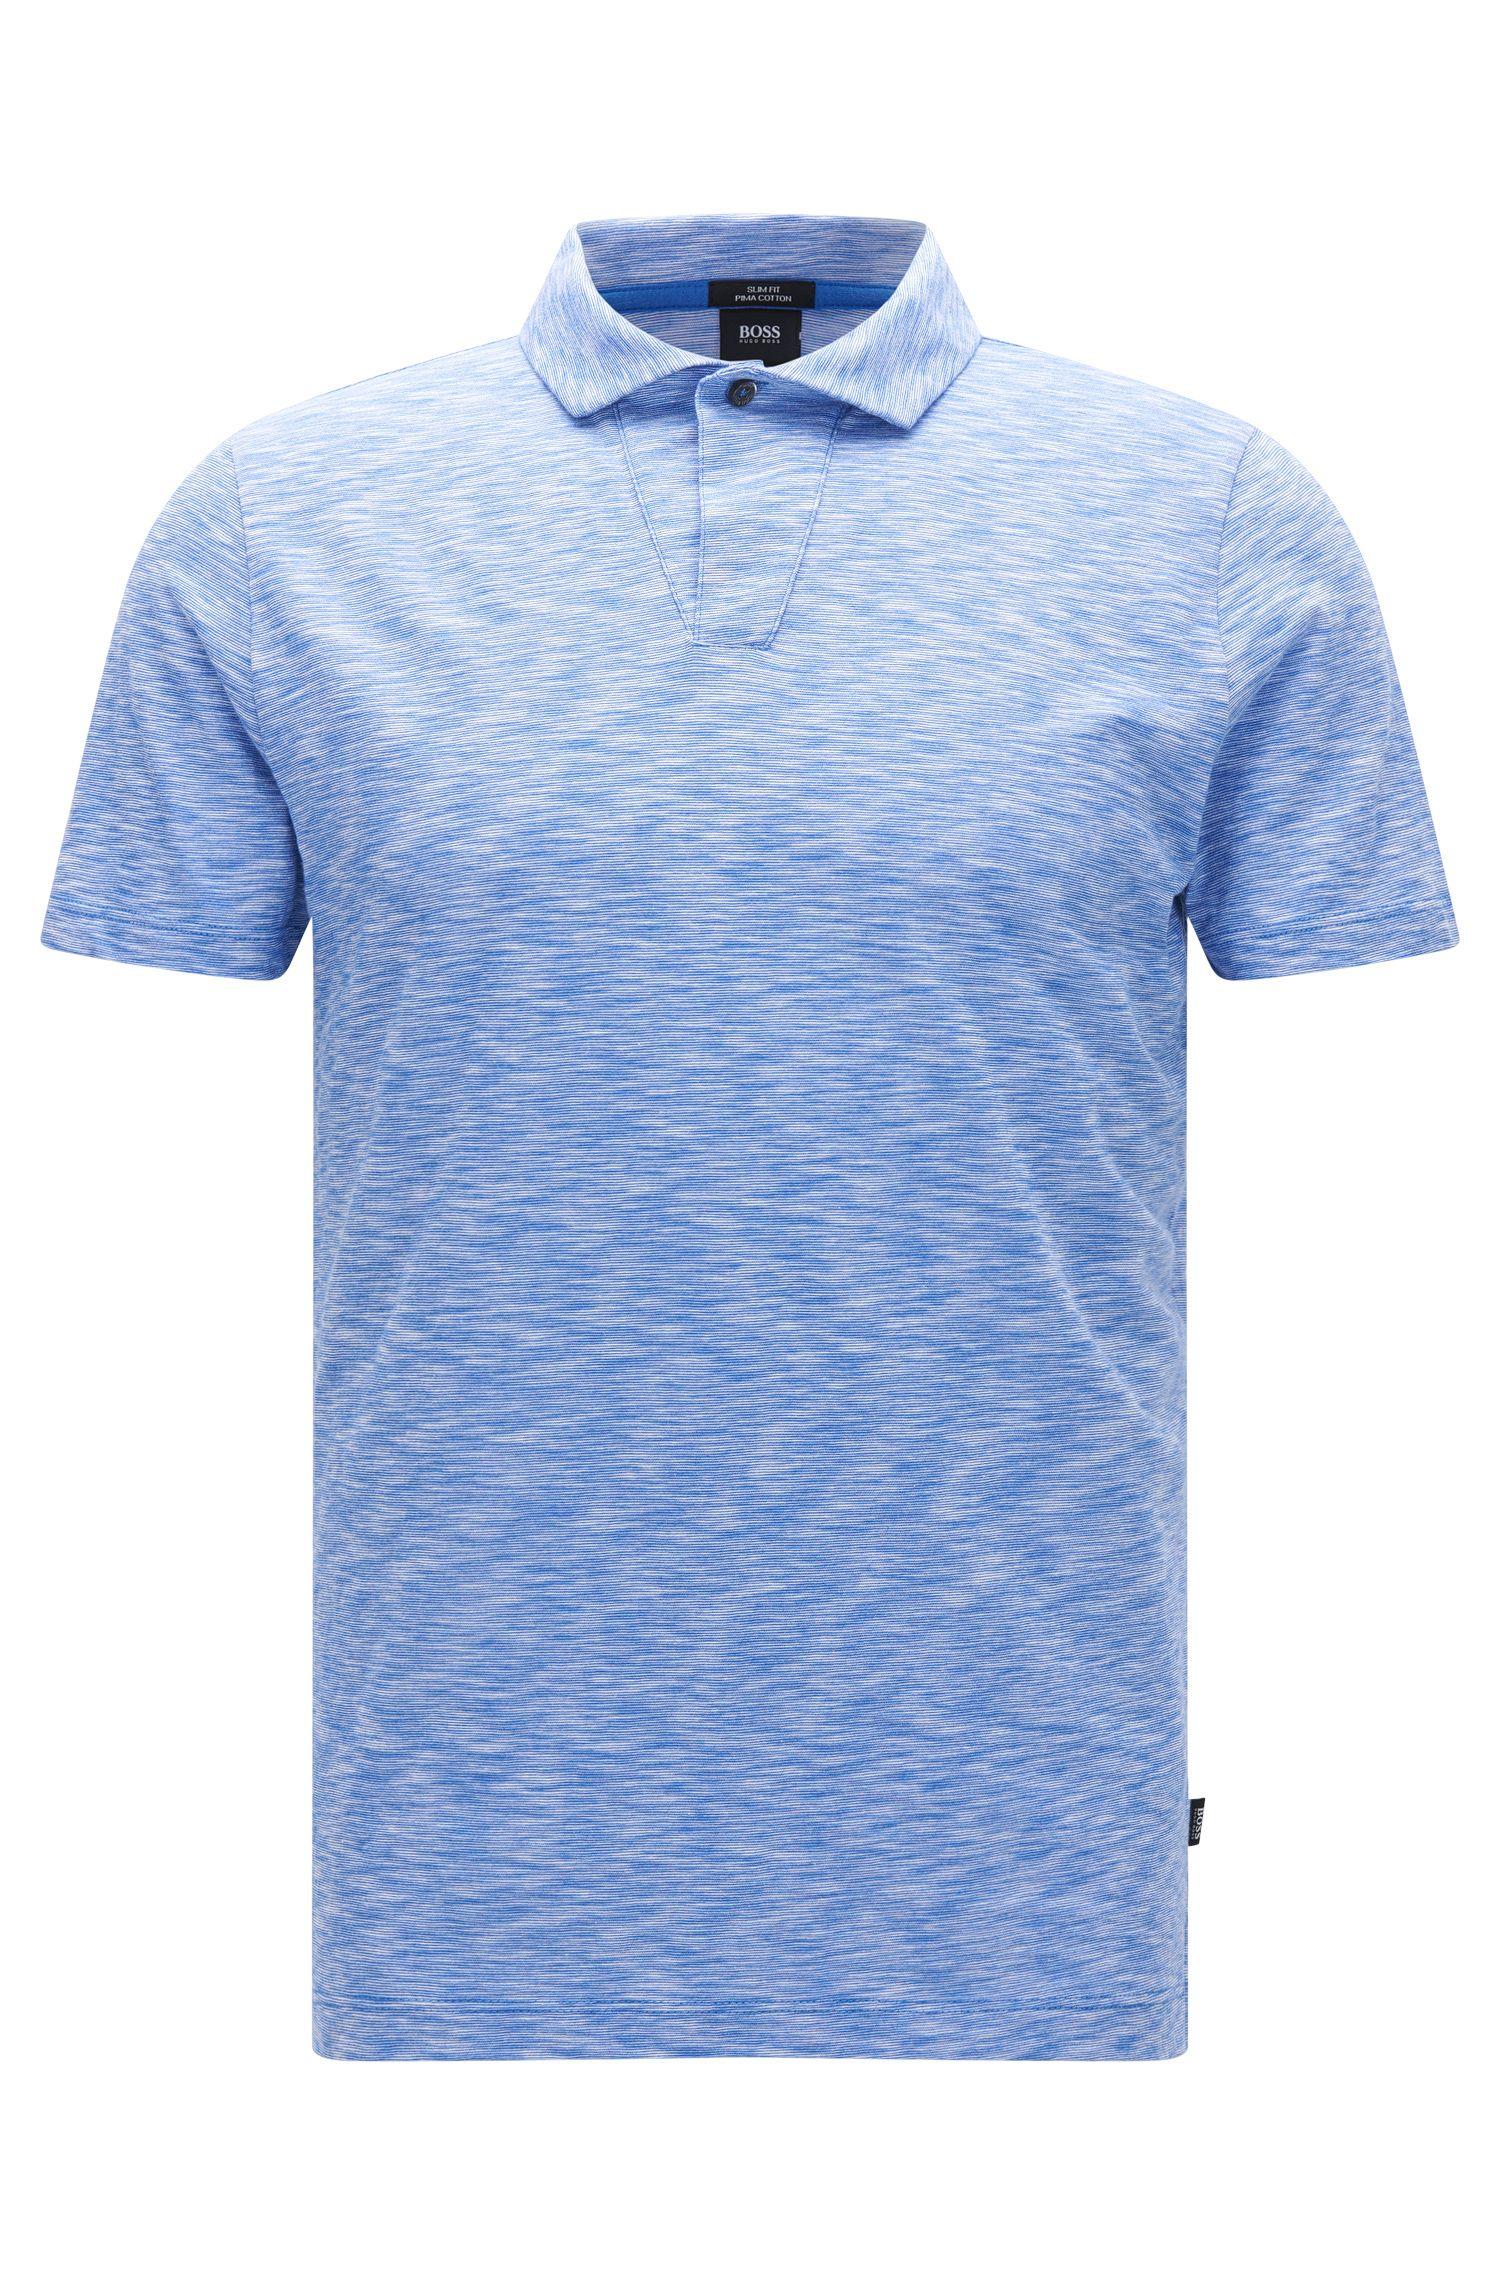 Pima Cotton Jersey Polo Shirt, Slim Fit | Plato